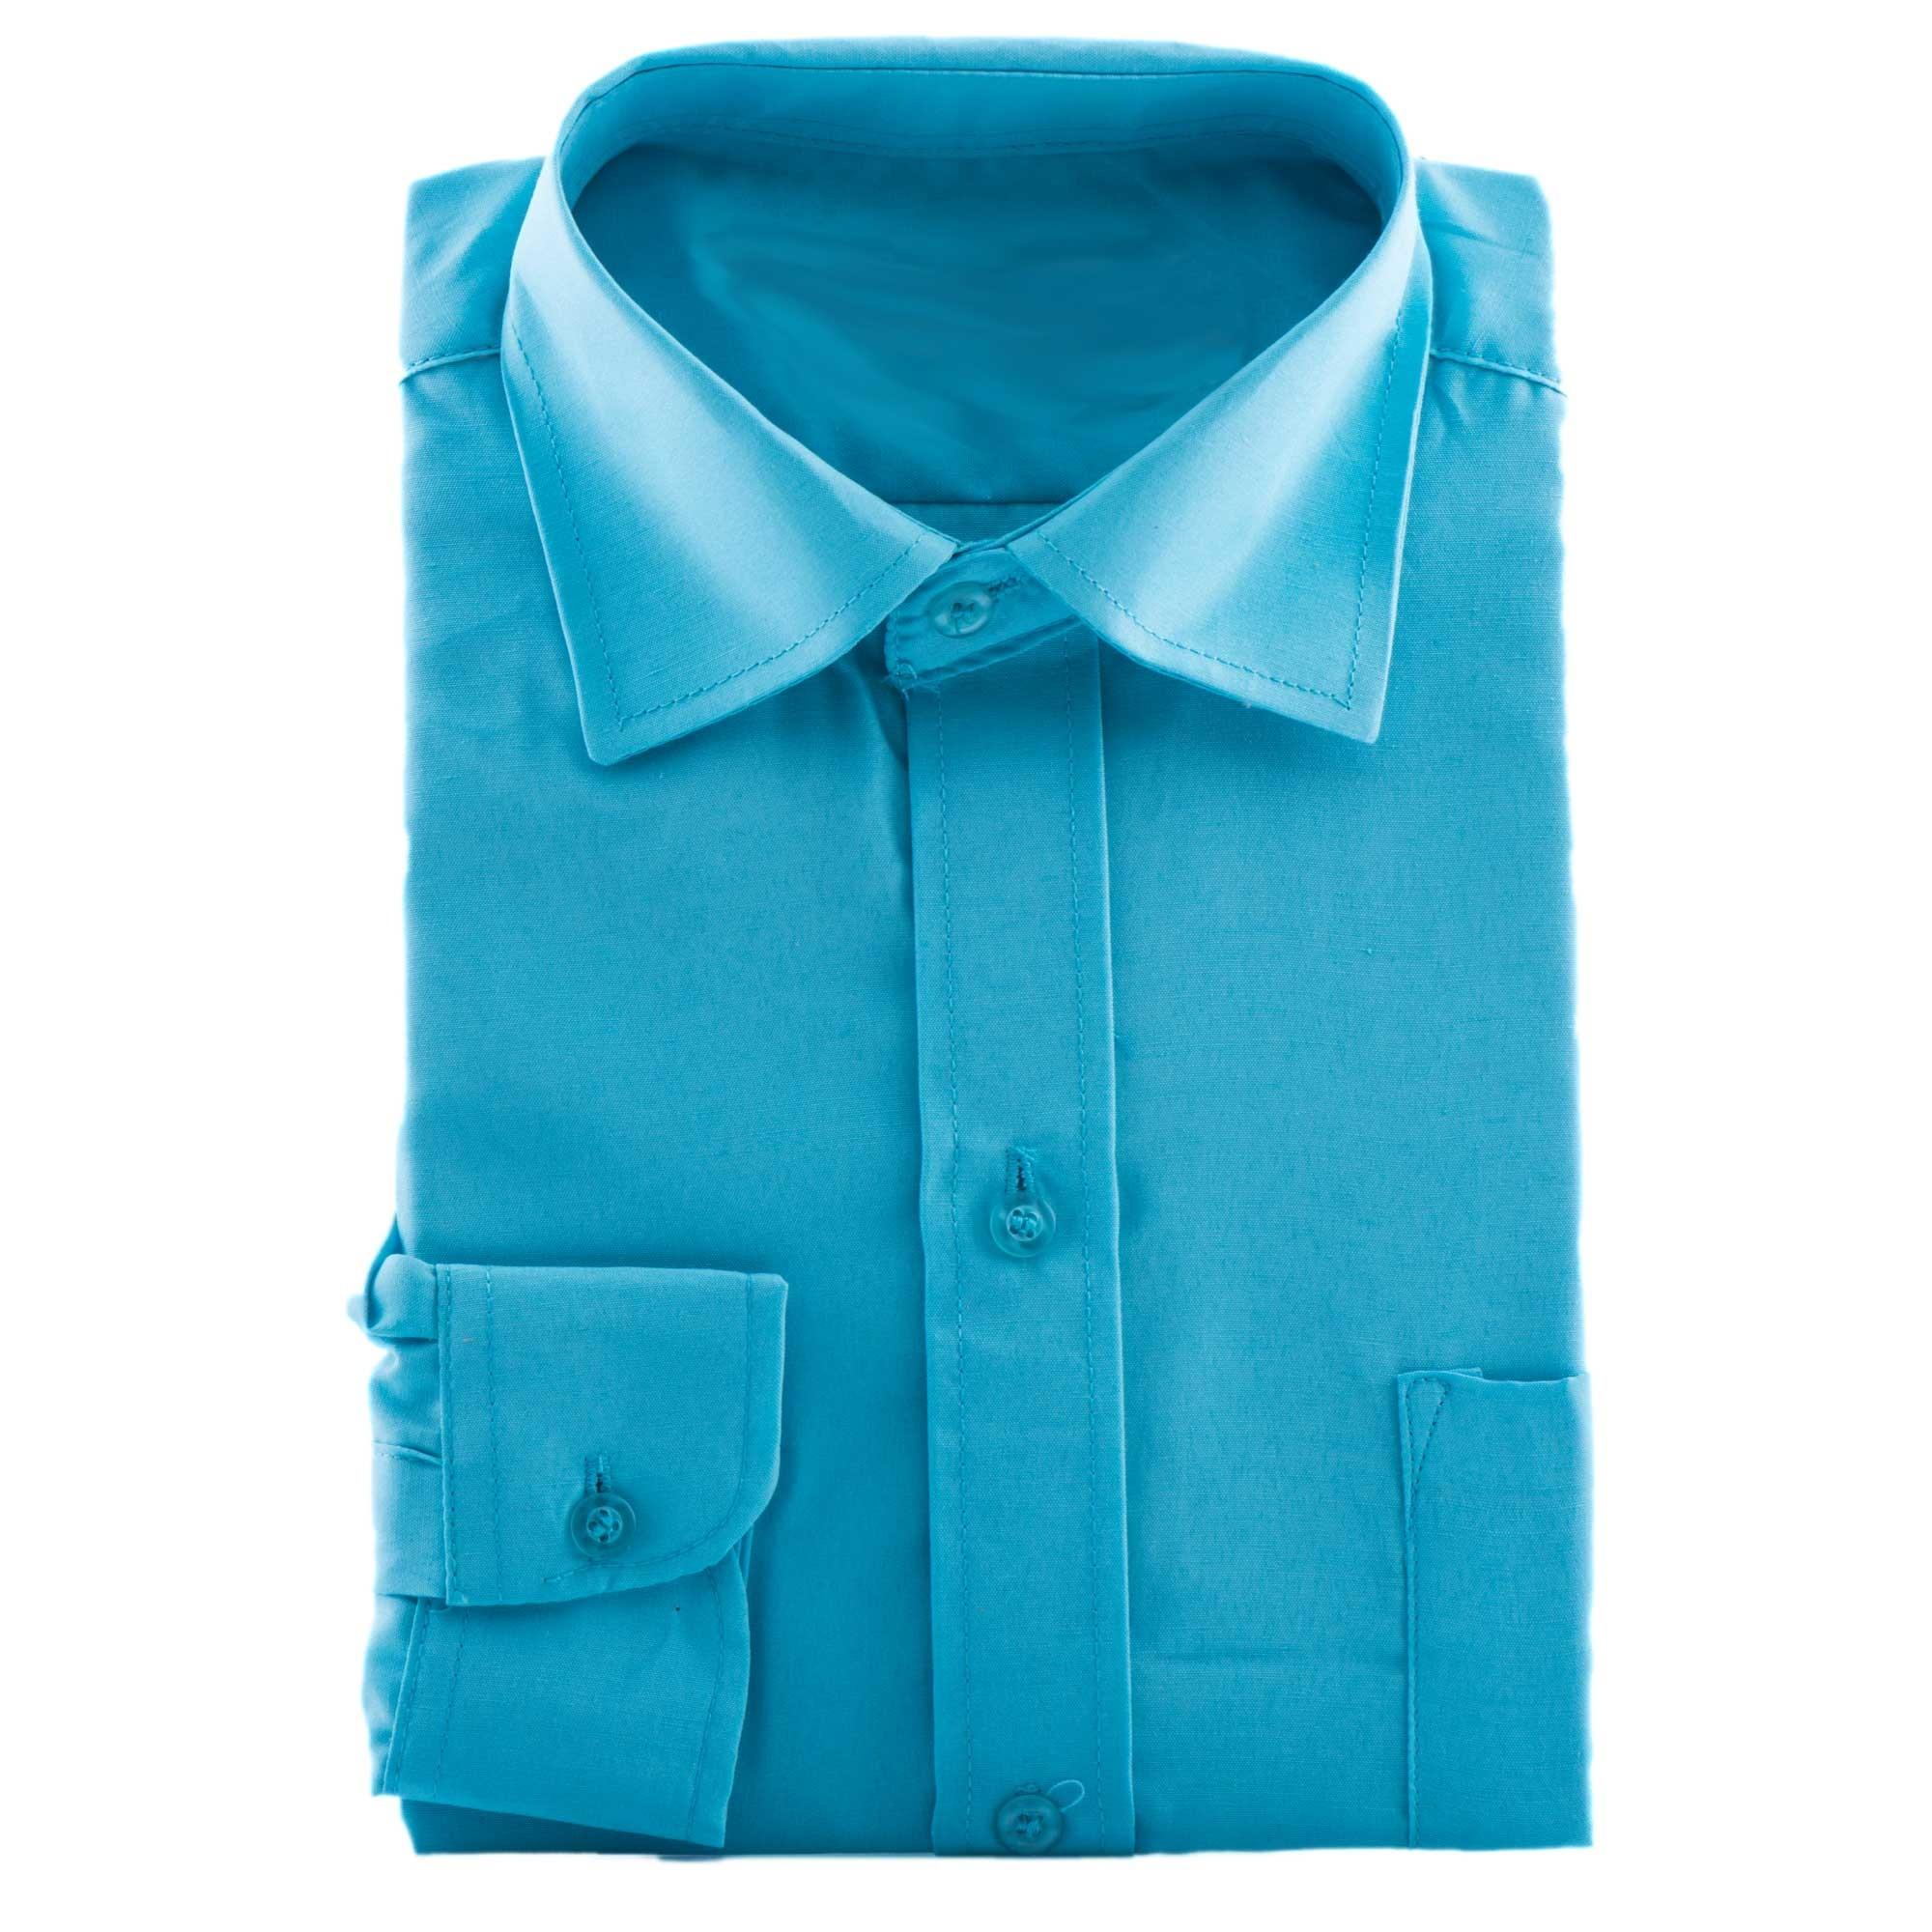 bruidsjonkers overhemd in de kleur blauw